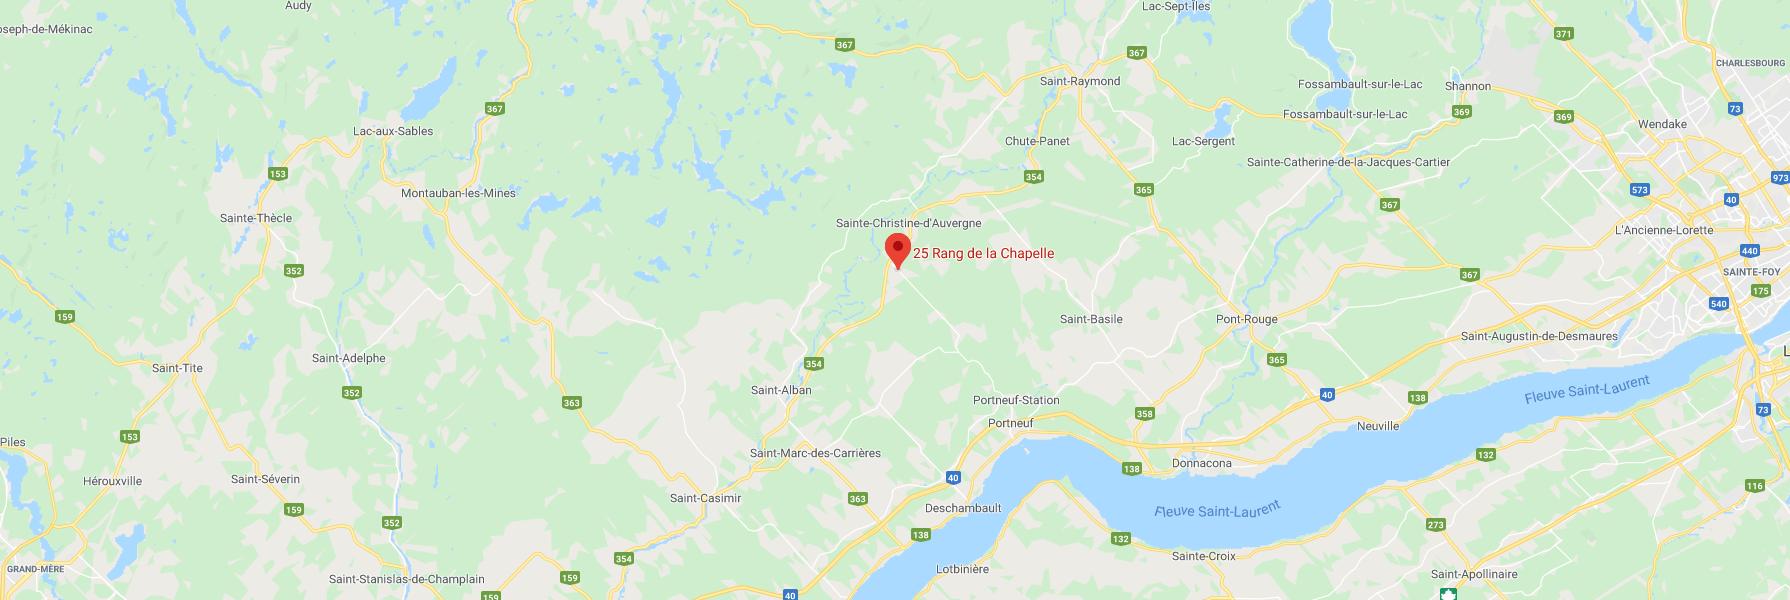 Pur-Safran_Google-Maps